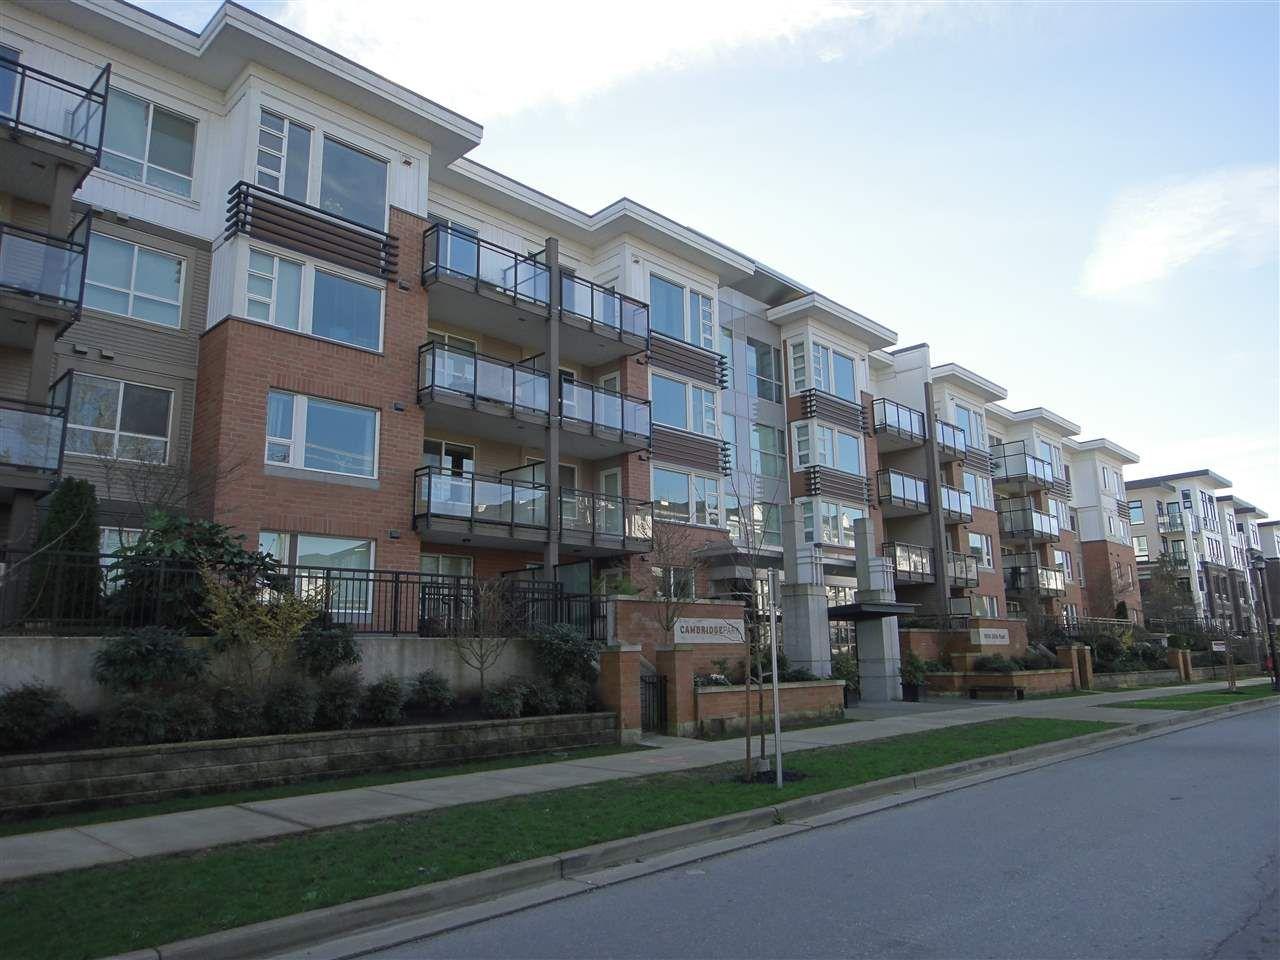 "Main Photo: 331 9500 ODLIN Road in Richmond: West Cambie Condo for sale in ""CAMBRIDGE PARK"" : MLS®# R2027225"